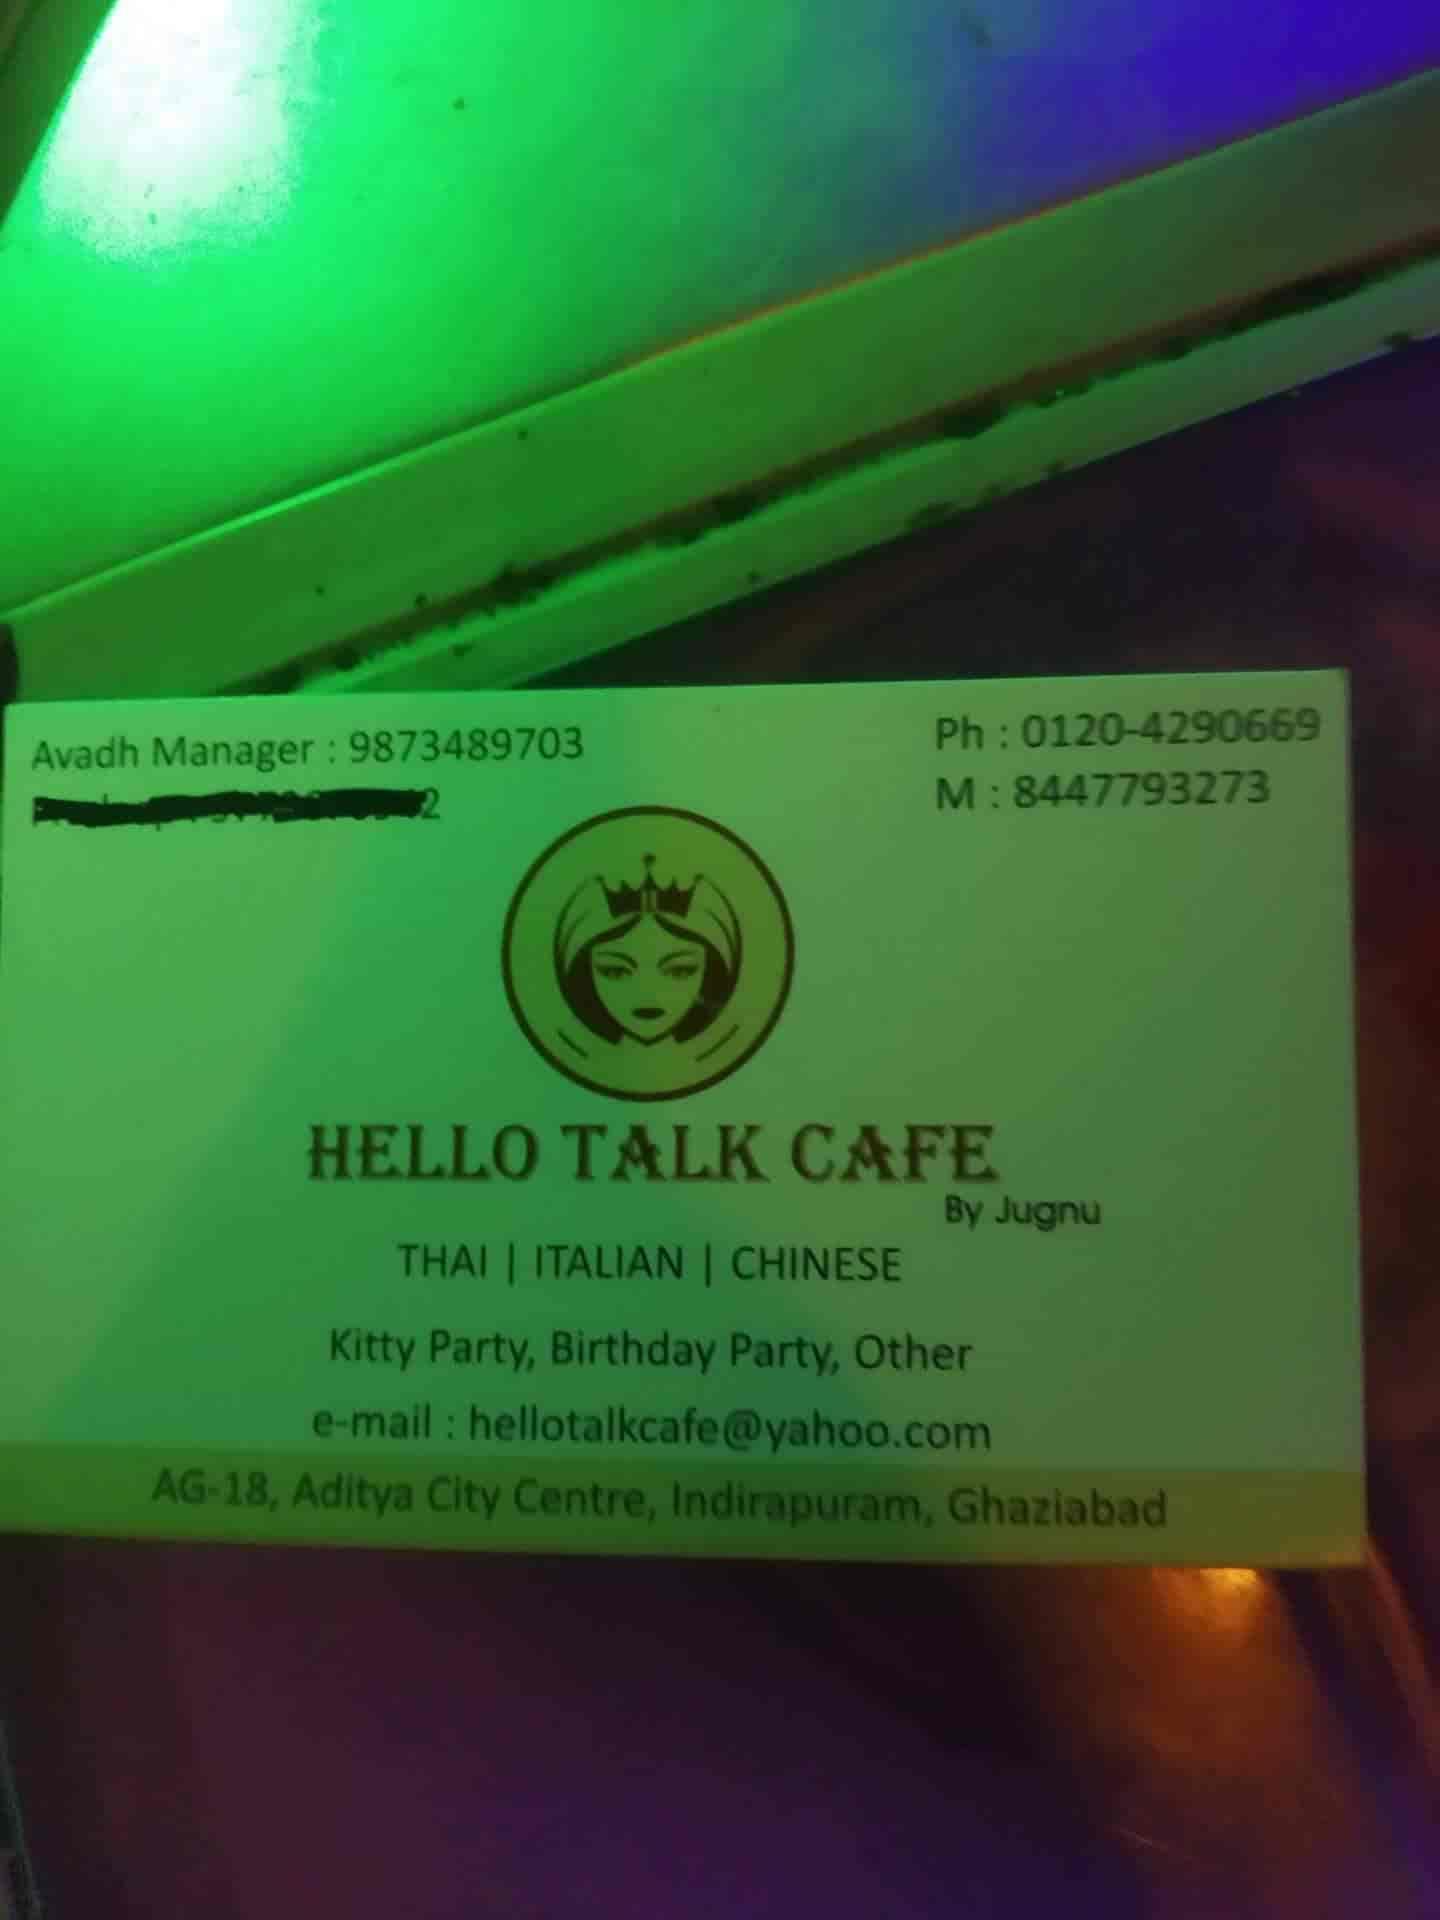 Hello Talk Cafe Reviews, Indirapuram, Ghaziabad - 131 Ratings - Justdial